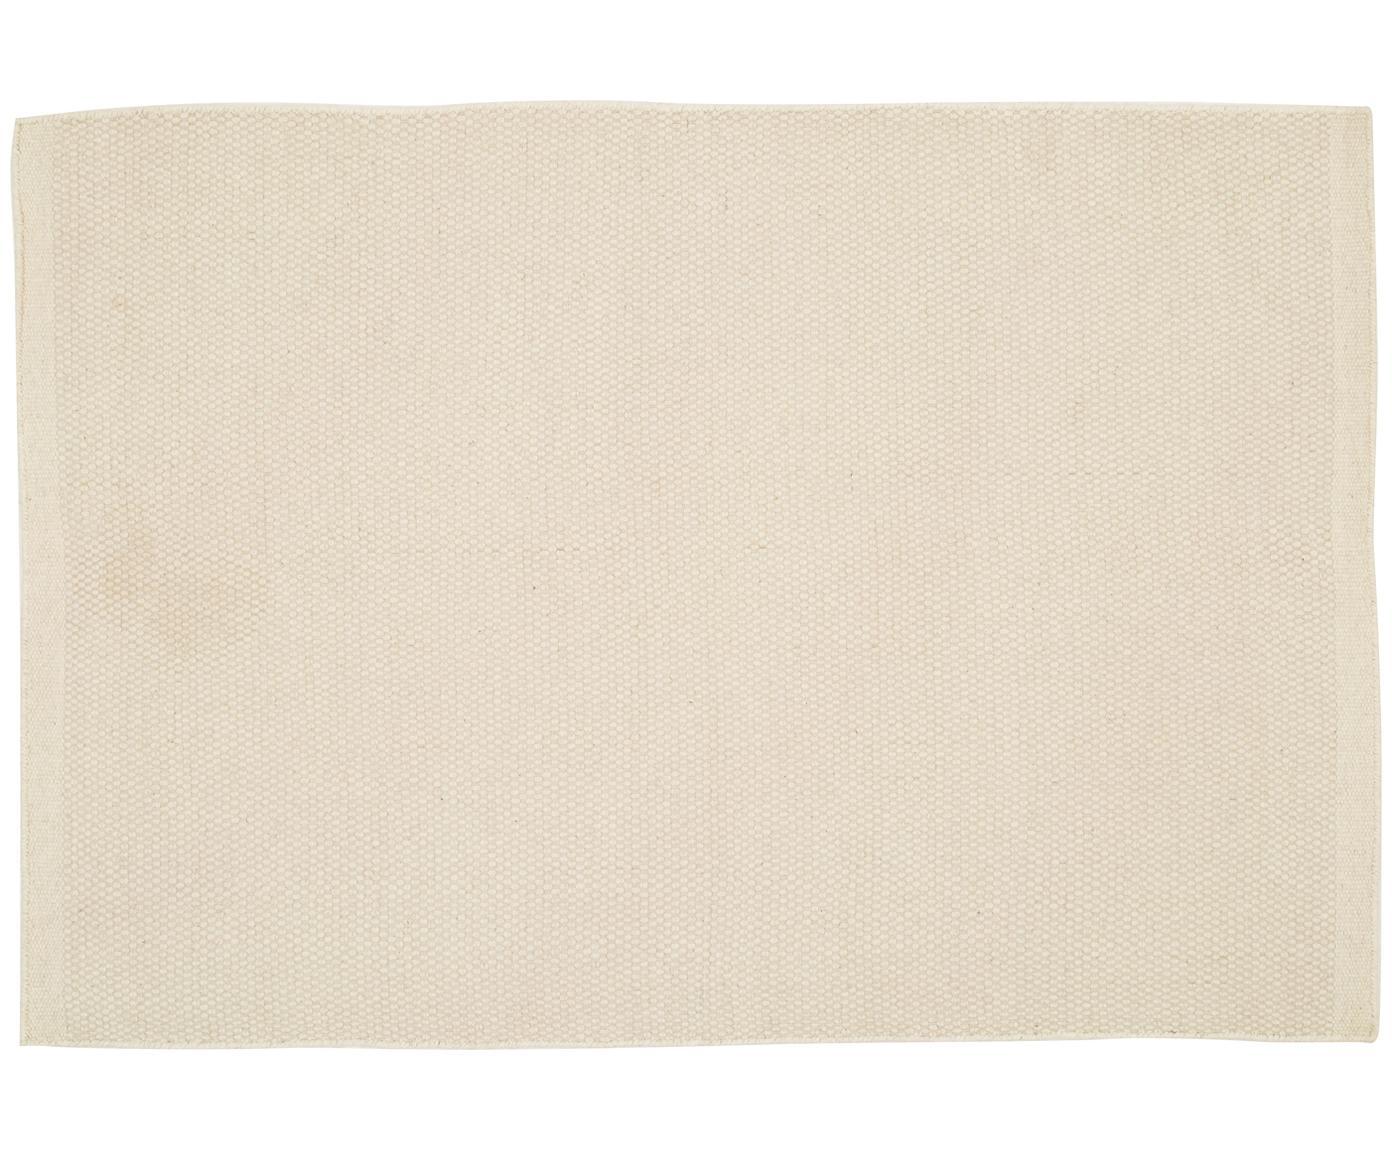 Alfombra artesanal de lana Delight, Blanco, An 200 x L 300 cm (Tamaño L)